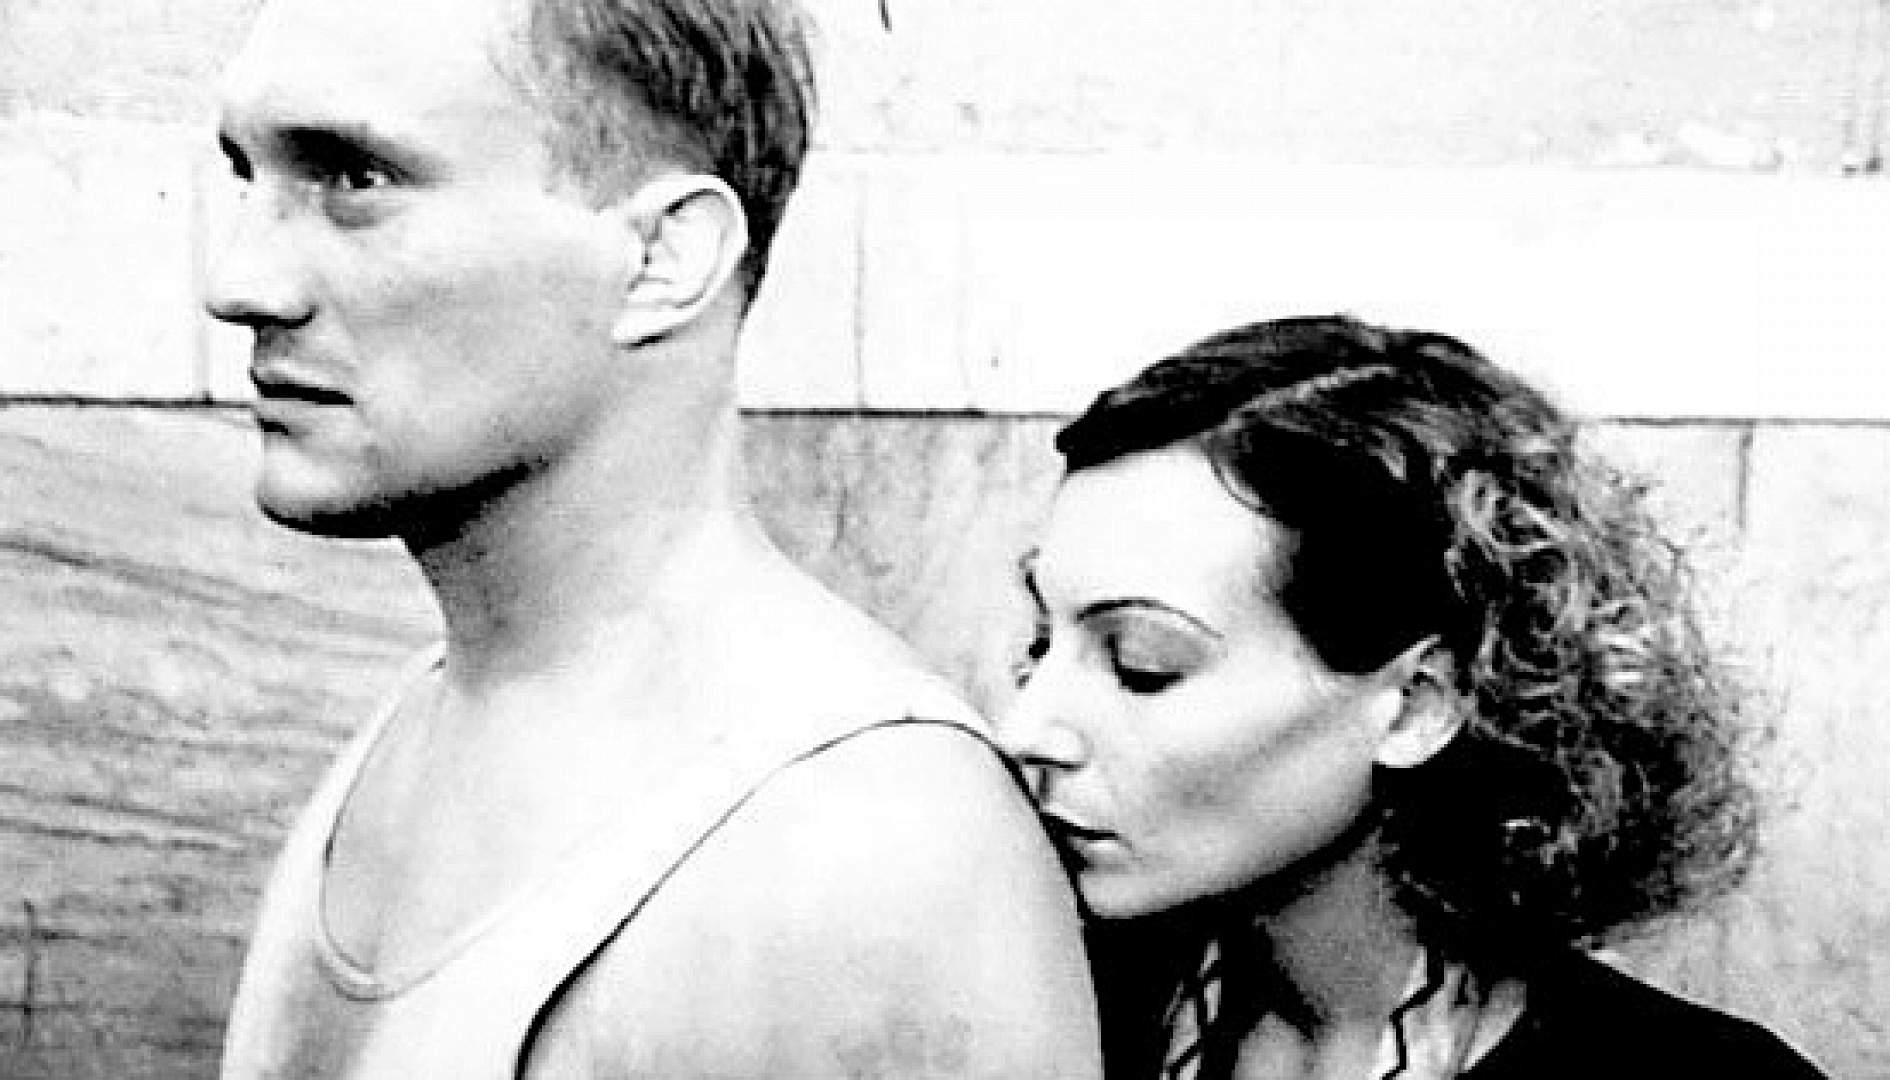 Рис.2: Кадр из фильма «Прорва»